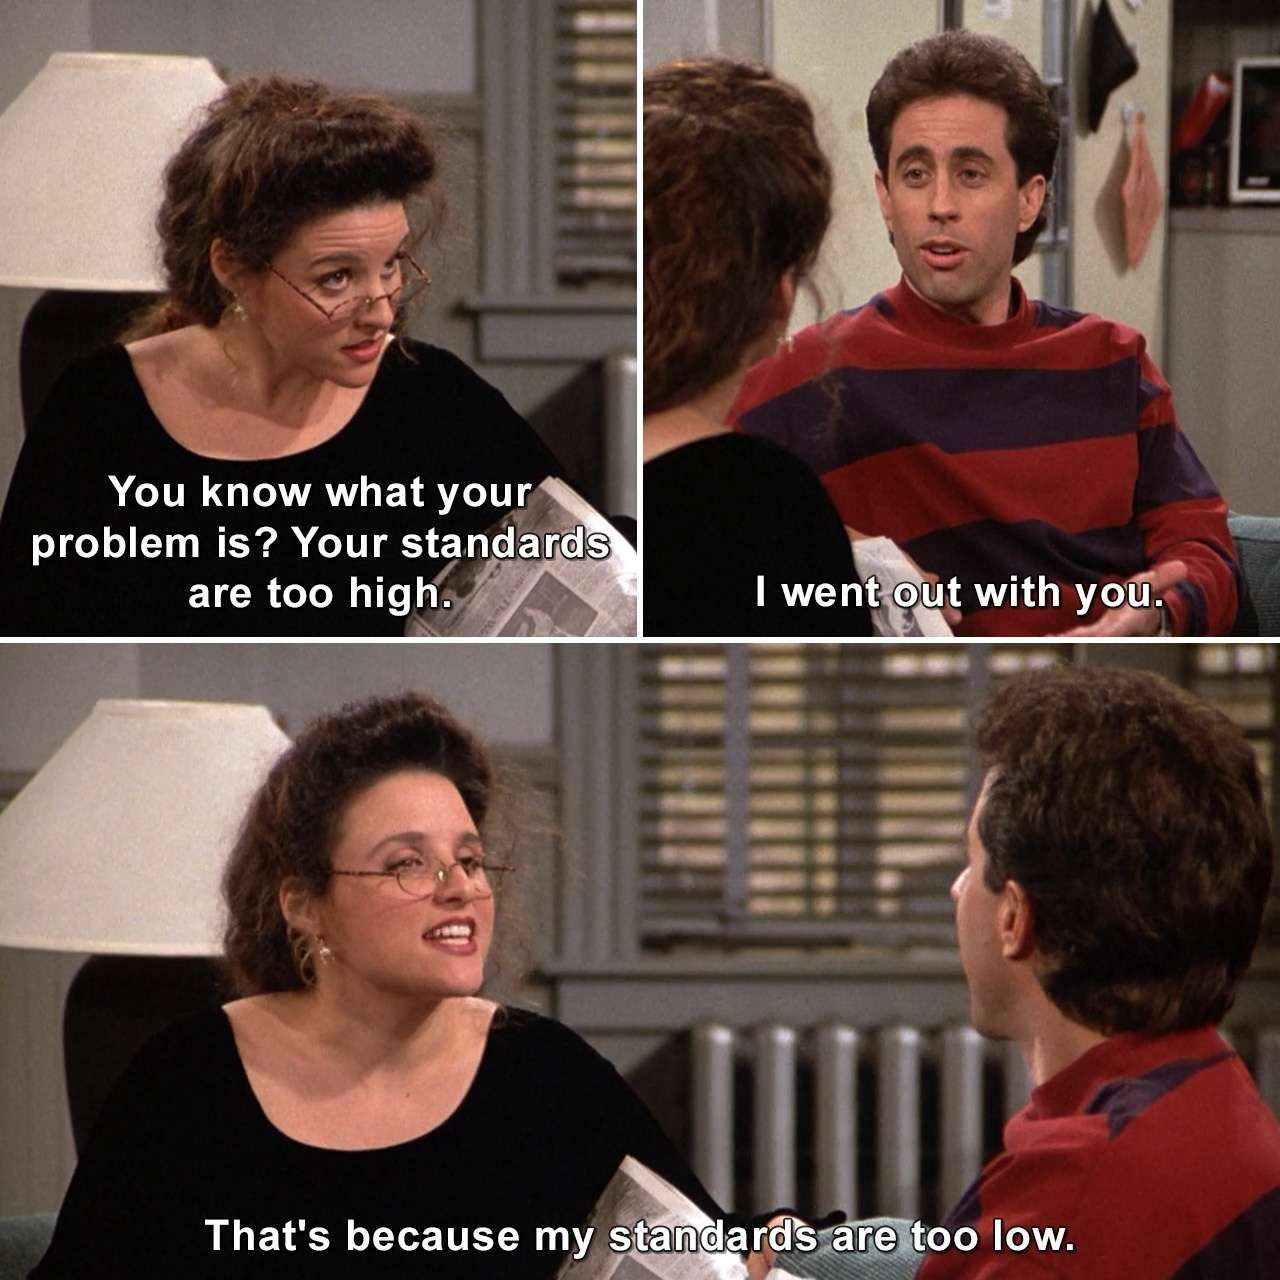 Your Standards Are Too High Elainebenes Jerryseinfeld Seinfeld Thefix Up Humor Lmao Lol Meme Memes Joke Jok Seinfeld Quotes Seinfeld Funny Seinfeld